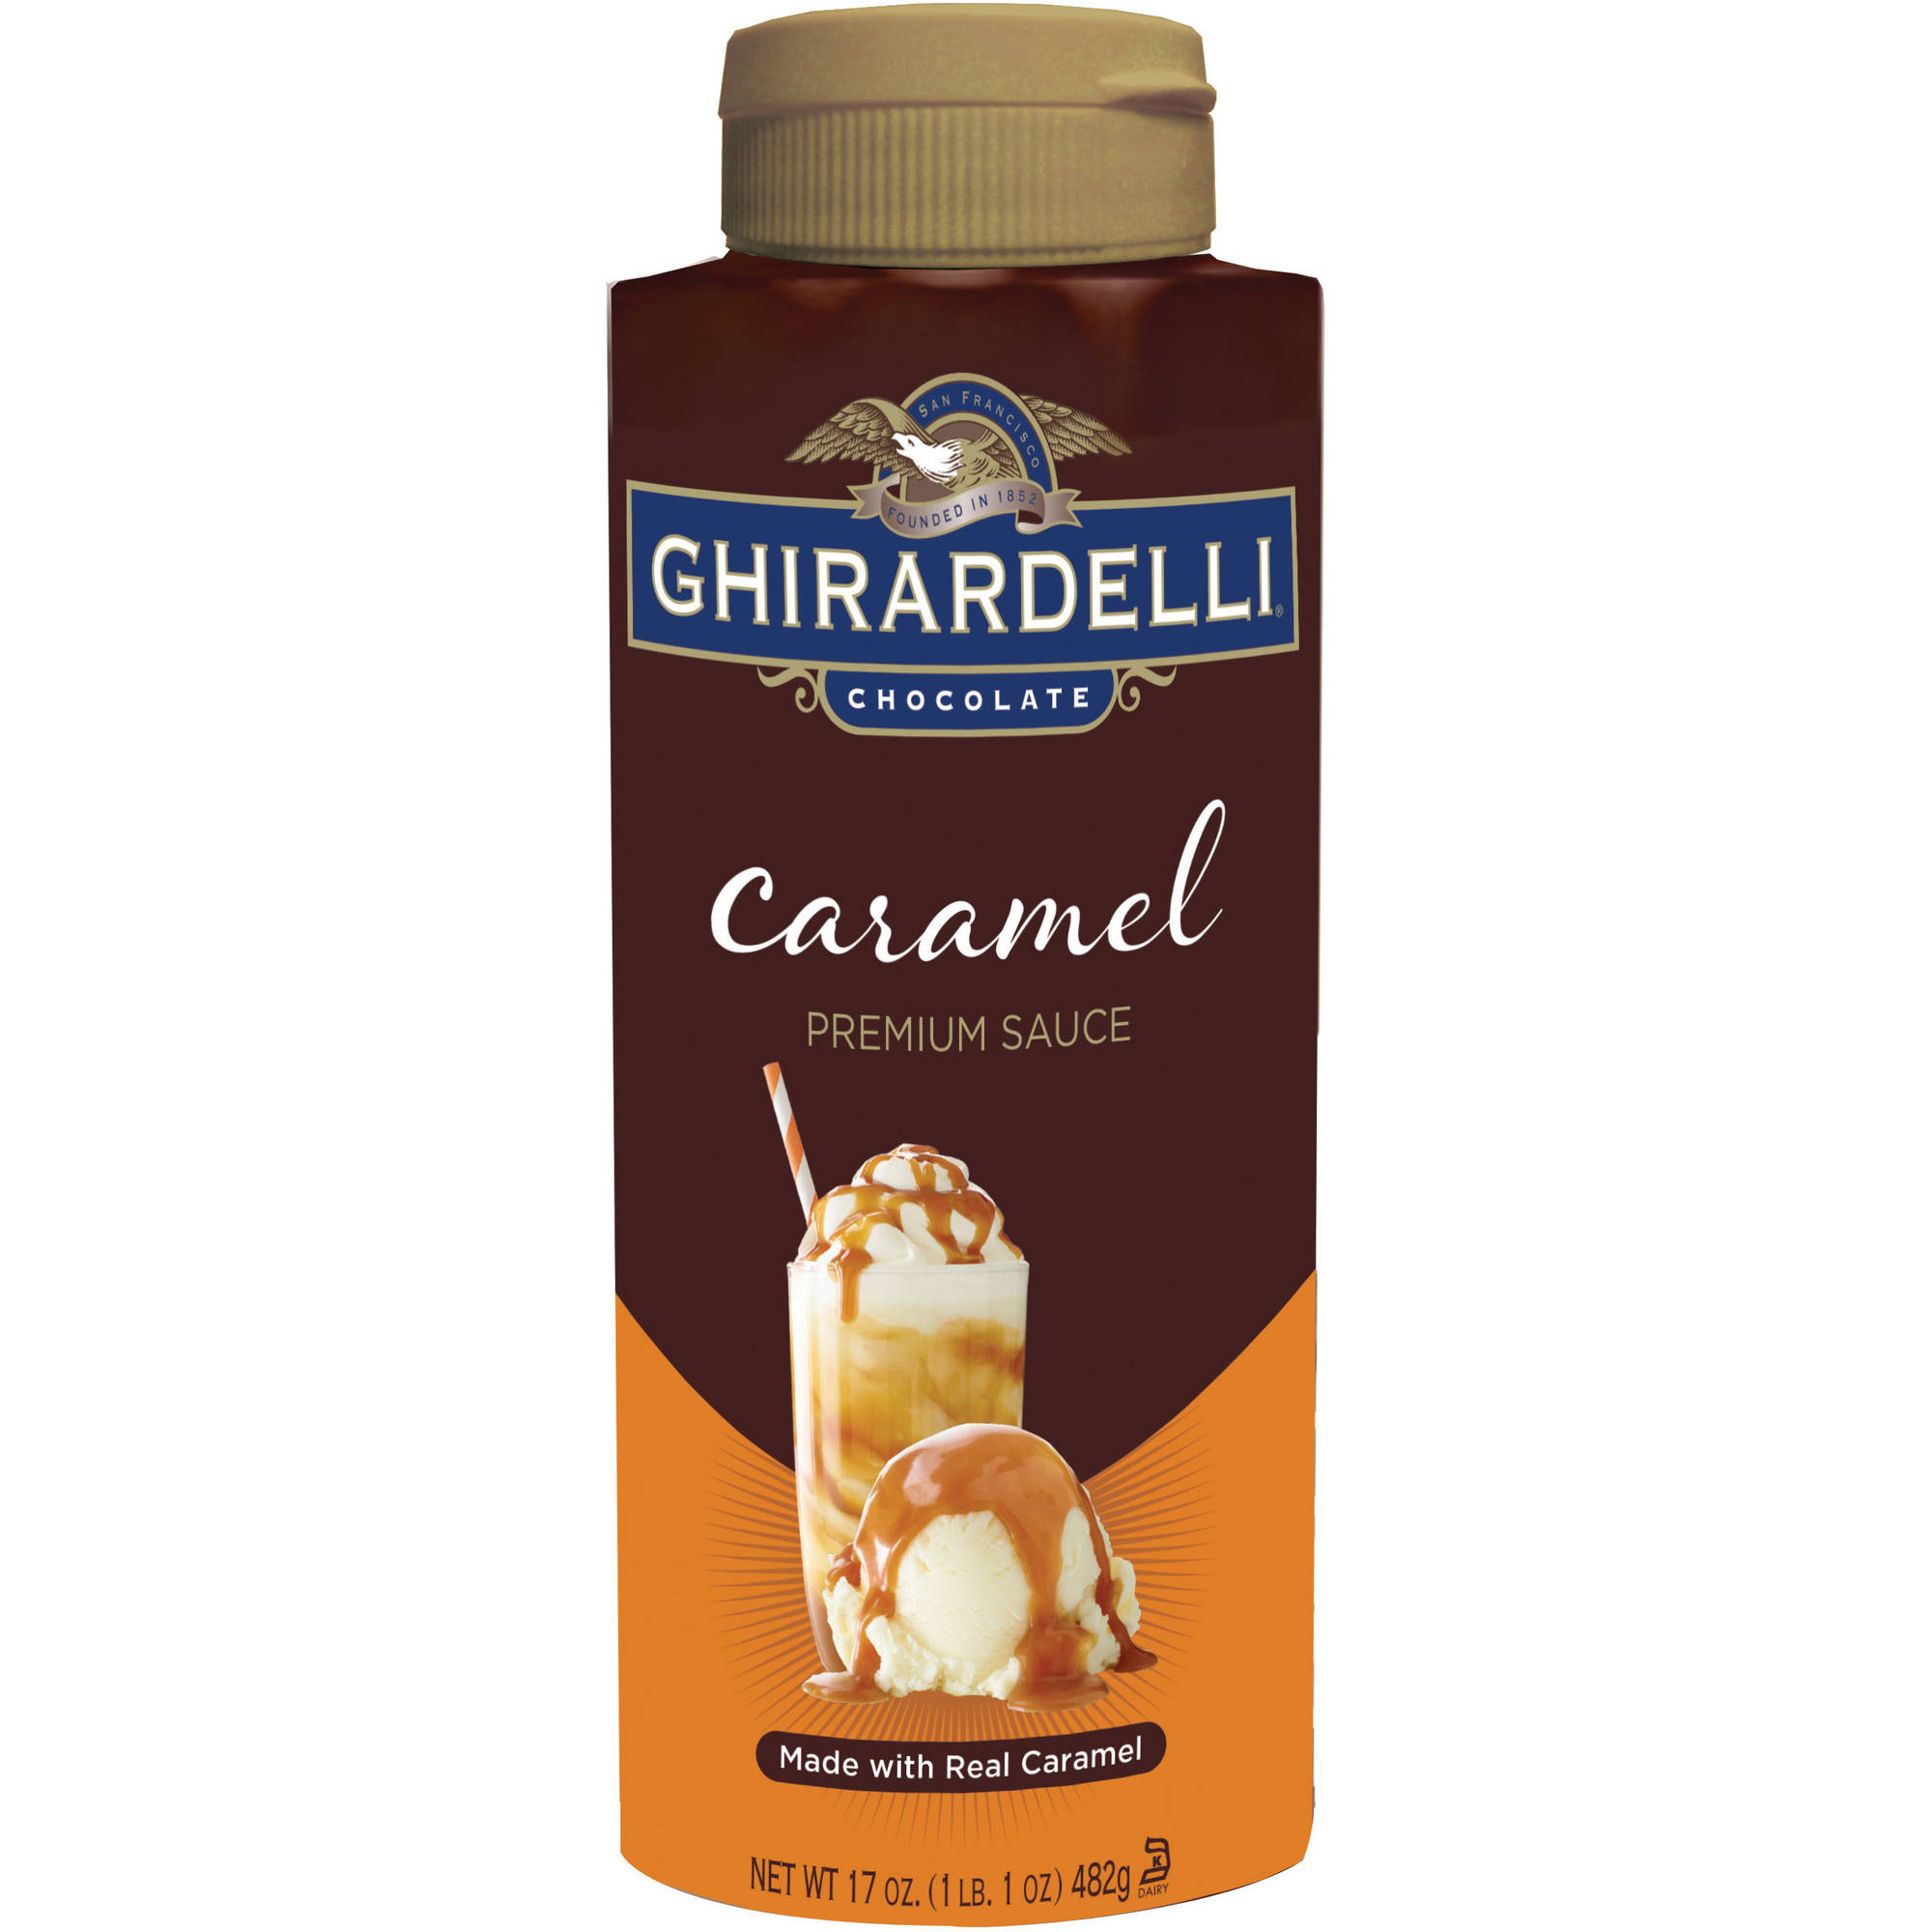 Ghirardelli Chocolate Caramel Premium Sauce, 17 oz